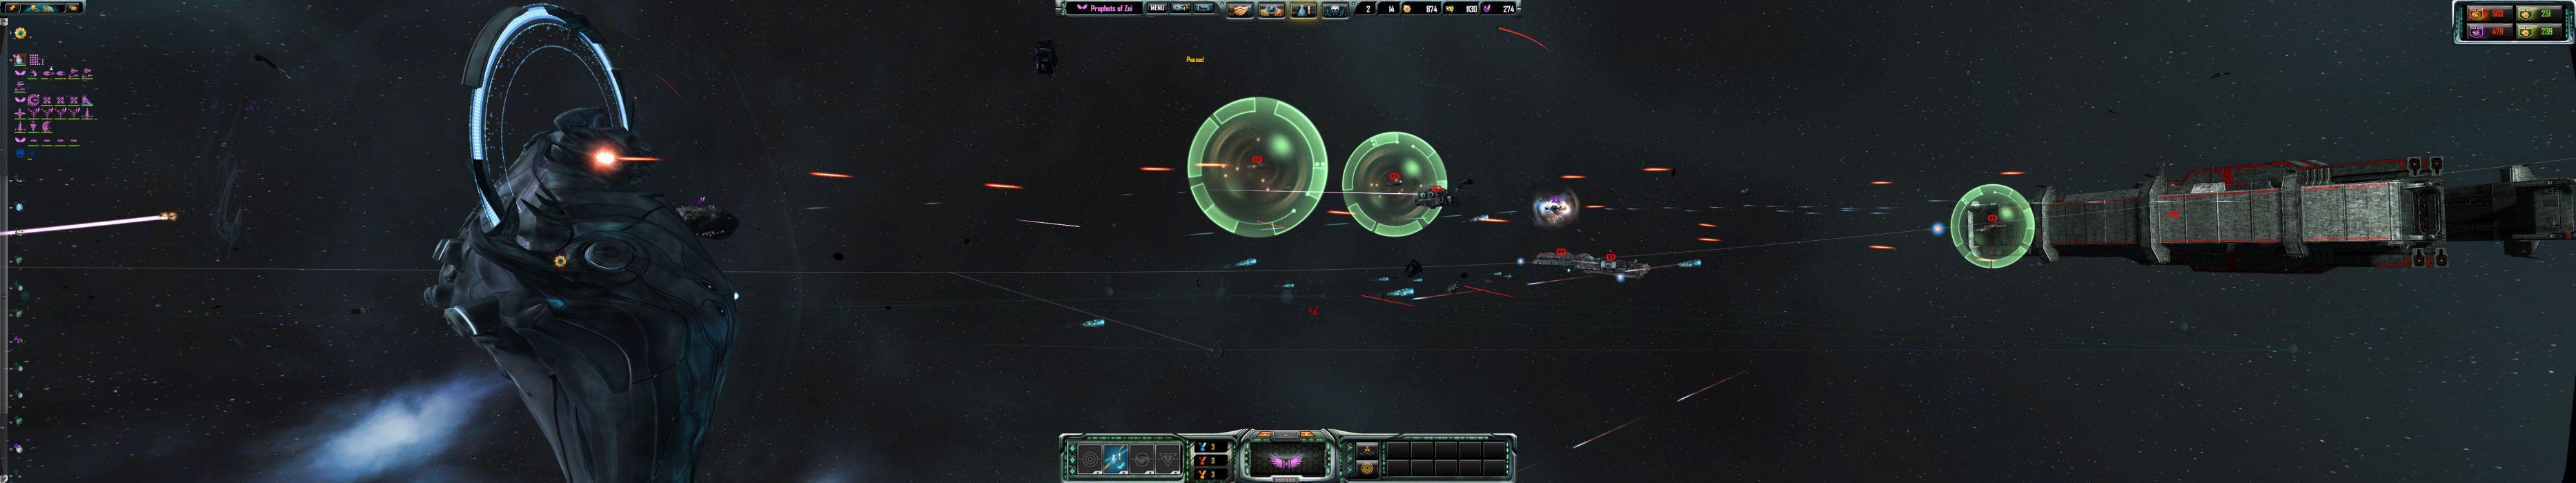 SINS-OF-A-SOLAR-EMPIRE sci-fi spaceship solar sins empire (37) wallpaper